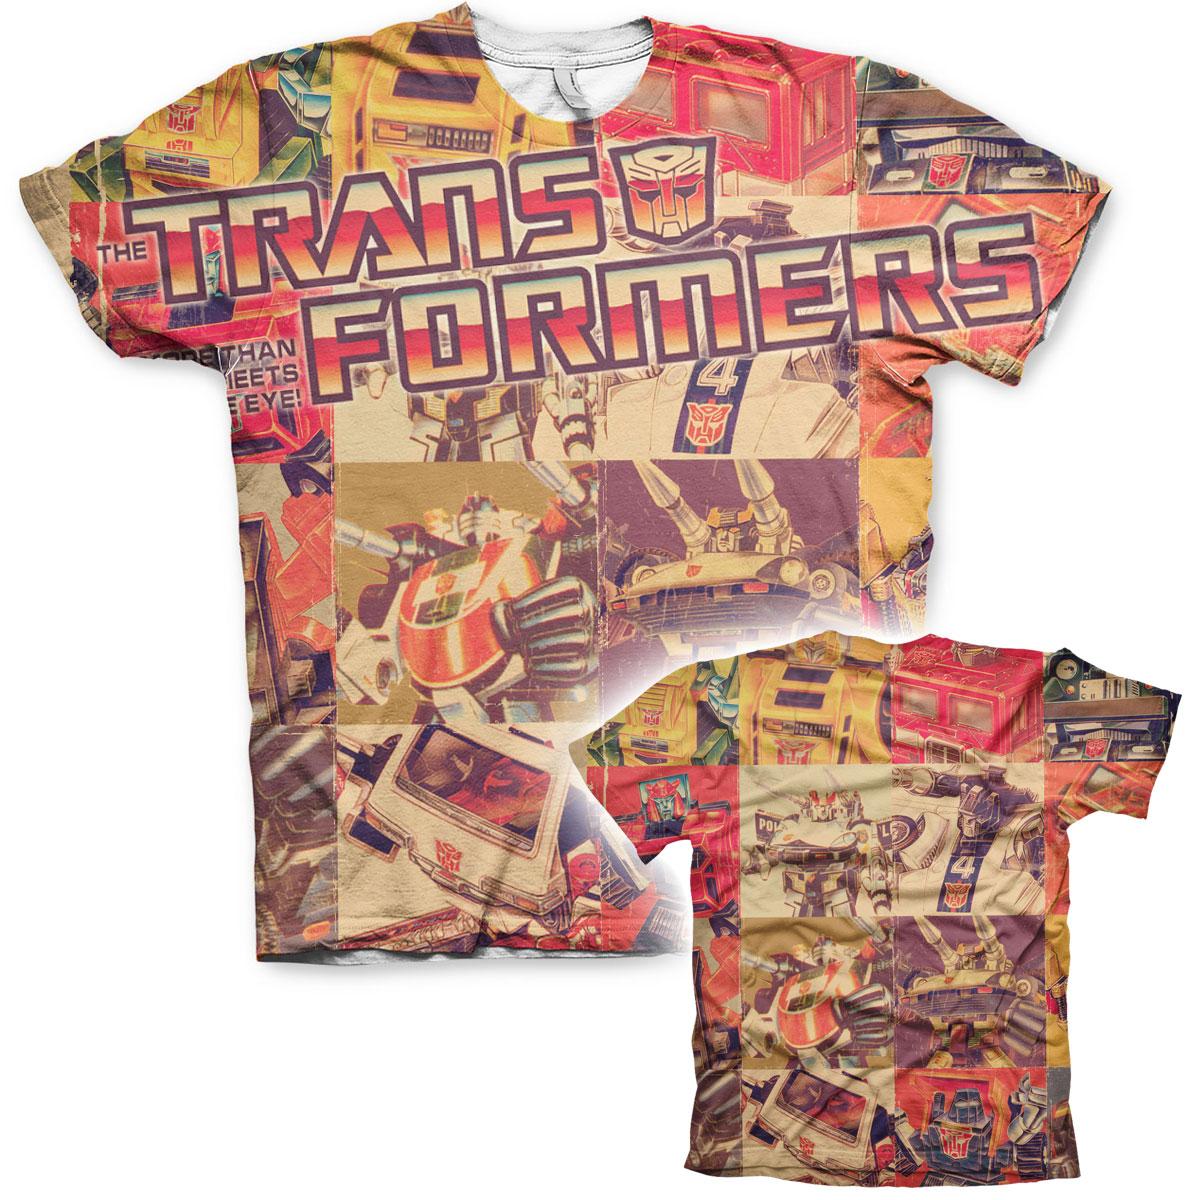 Retro Transformers Allover T-Shirt